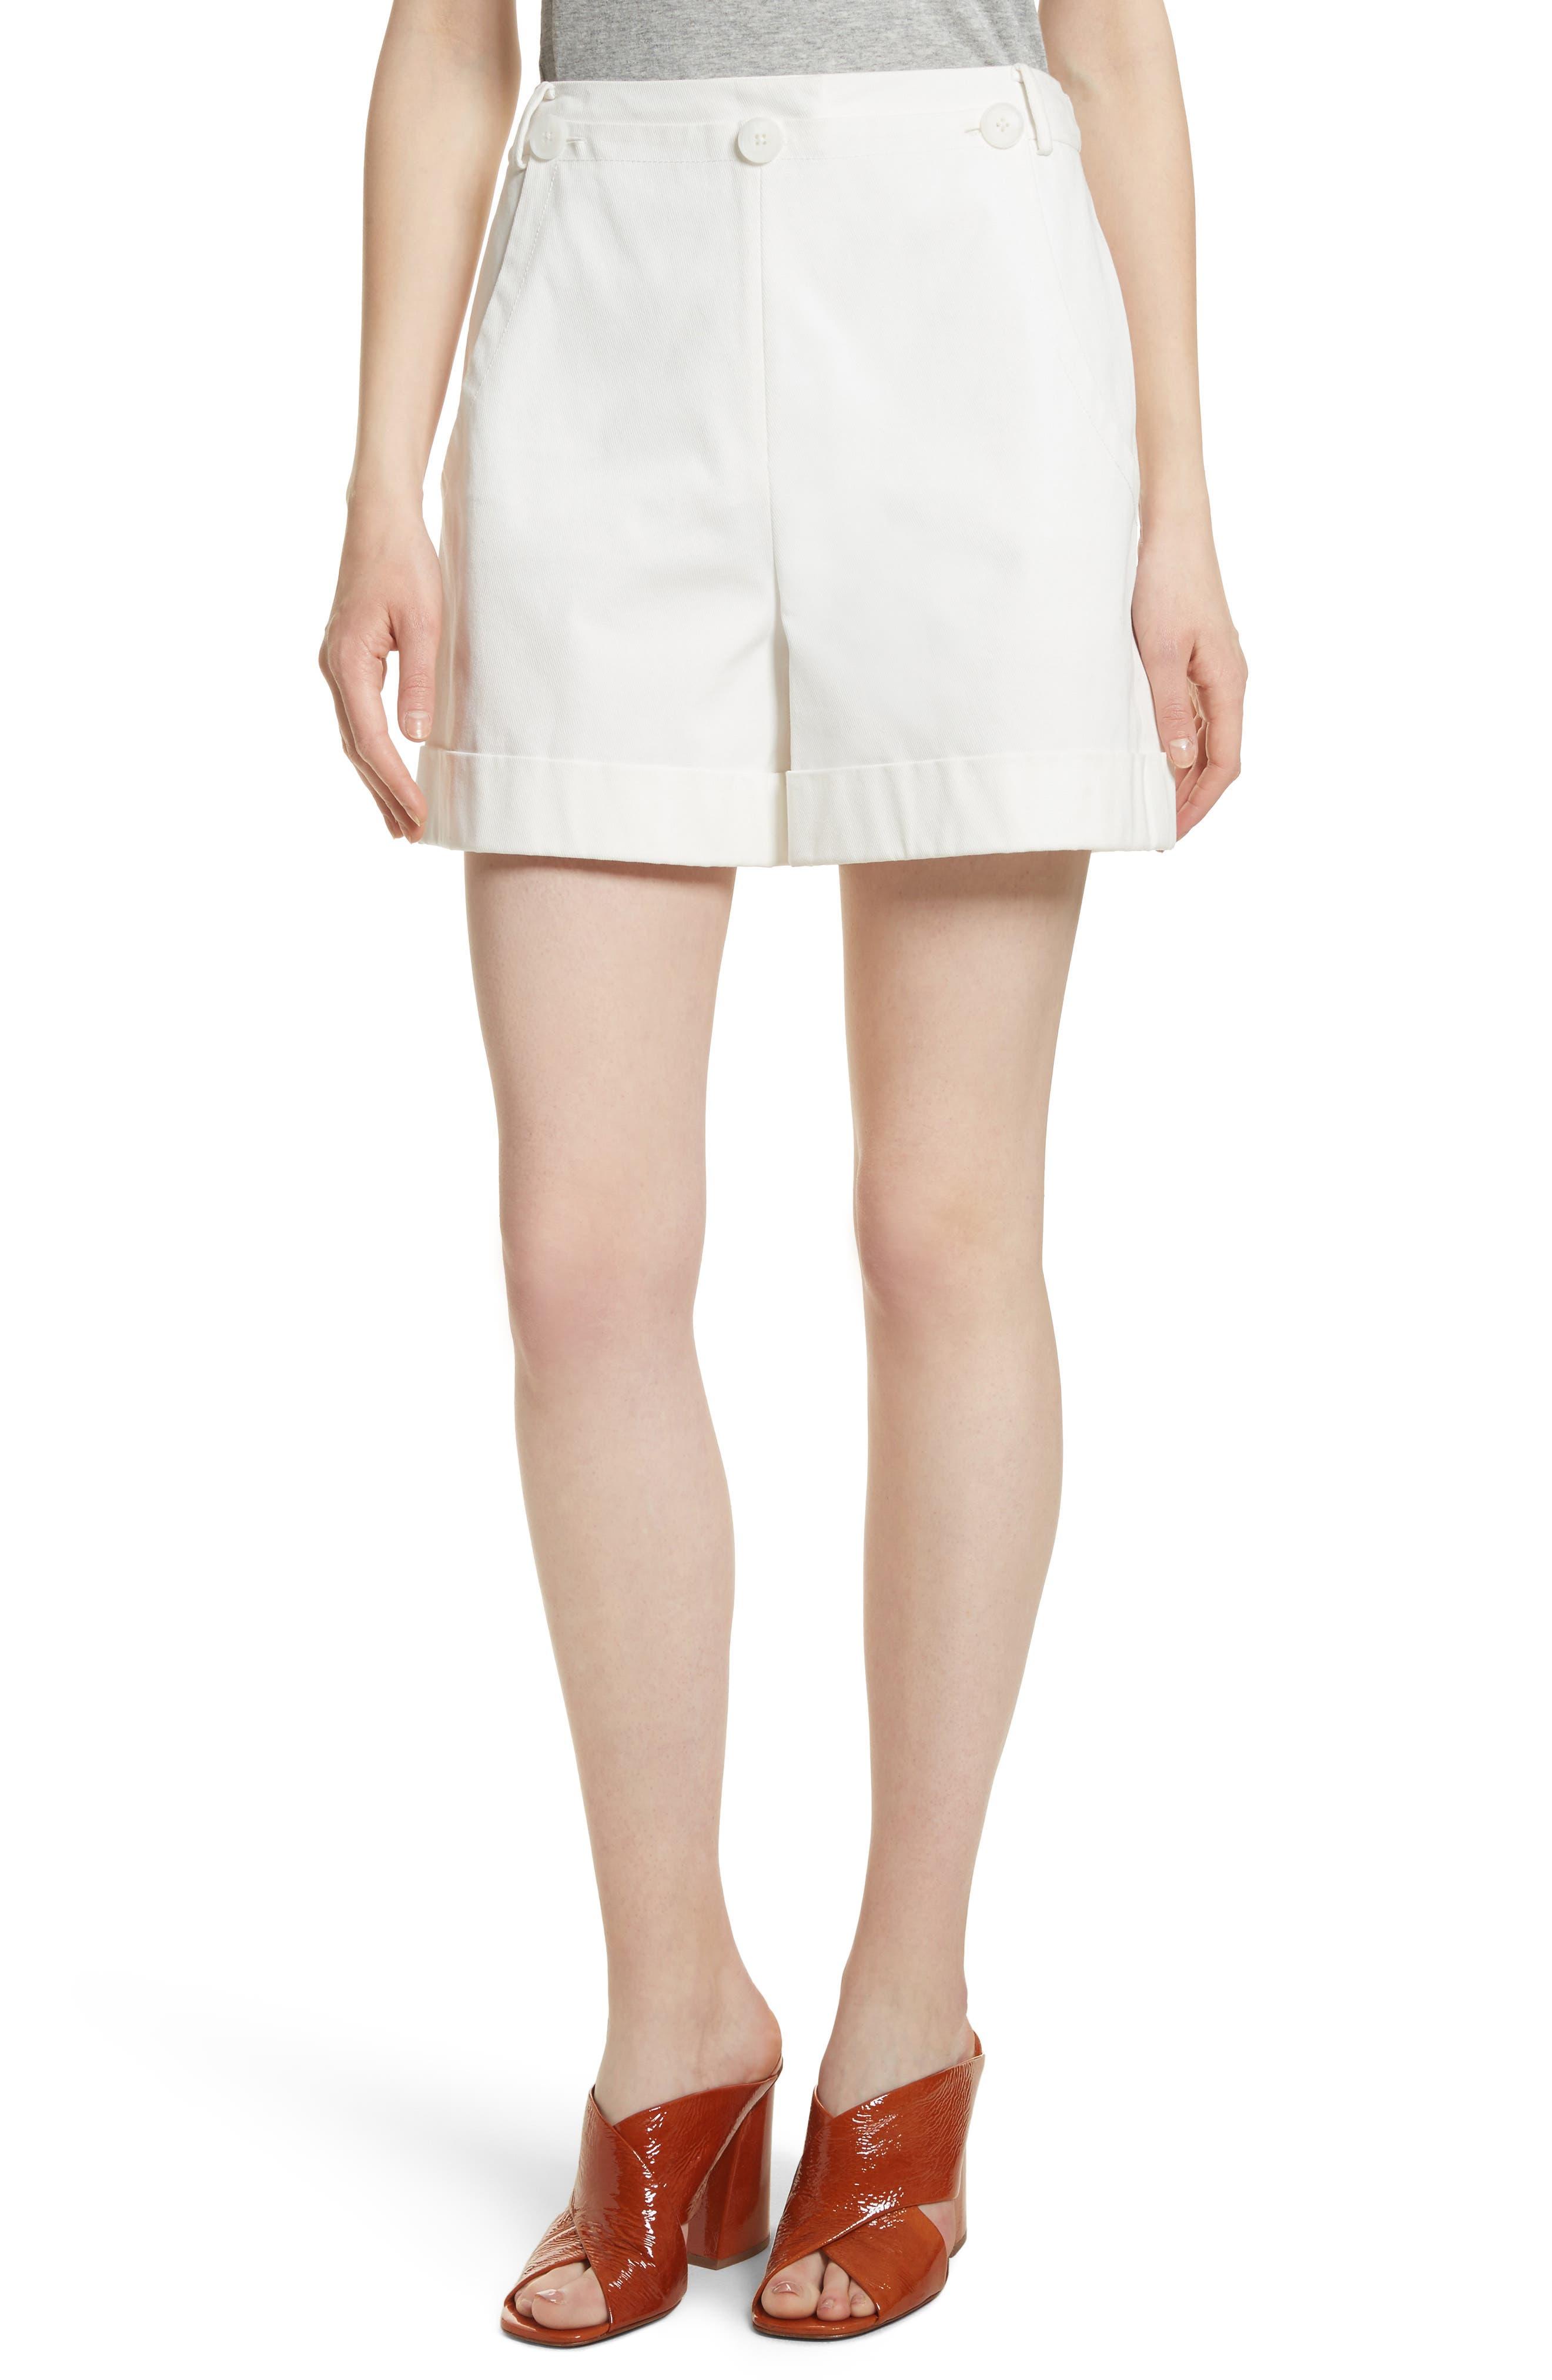 GREY Jason Wu Stretch Cotton Sailor Shorts,                             Main thumbnail 1, color,                             110